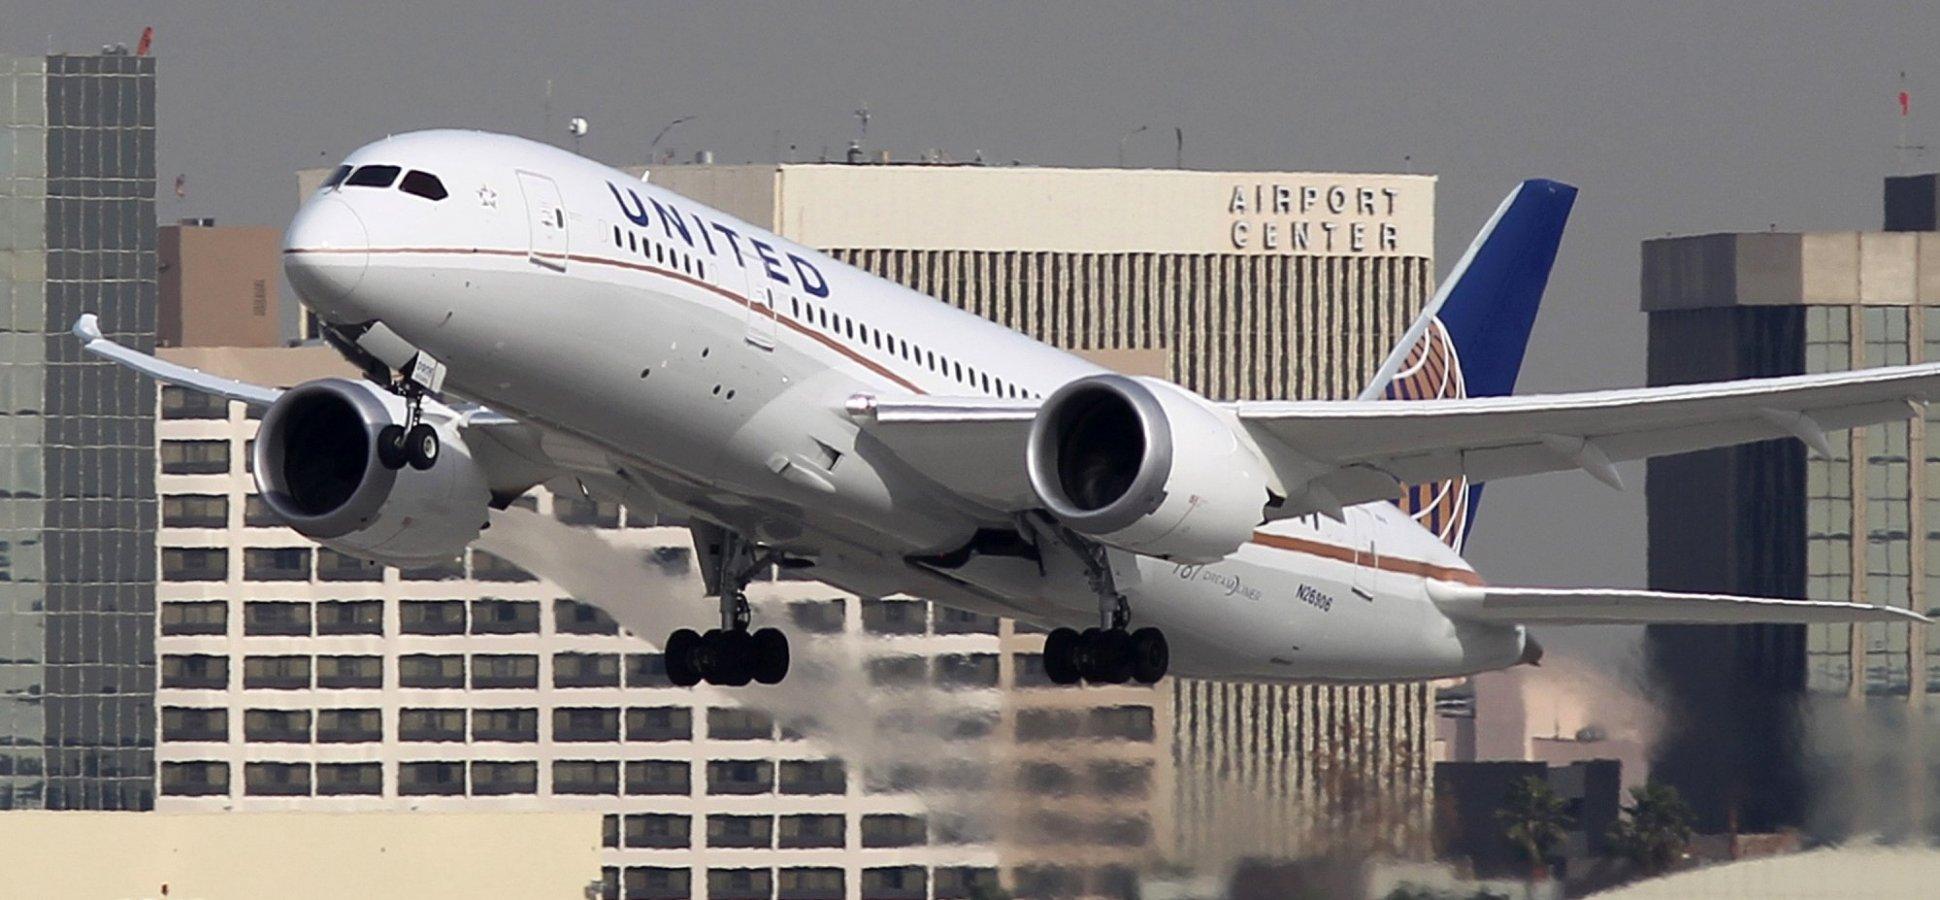 dress - Essences herbal airplane say yes again video